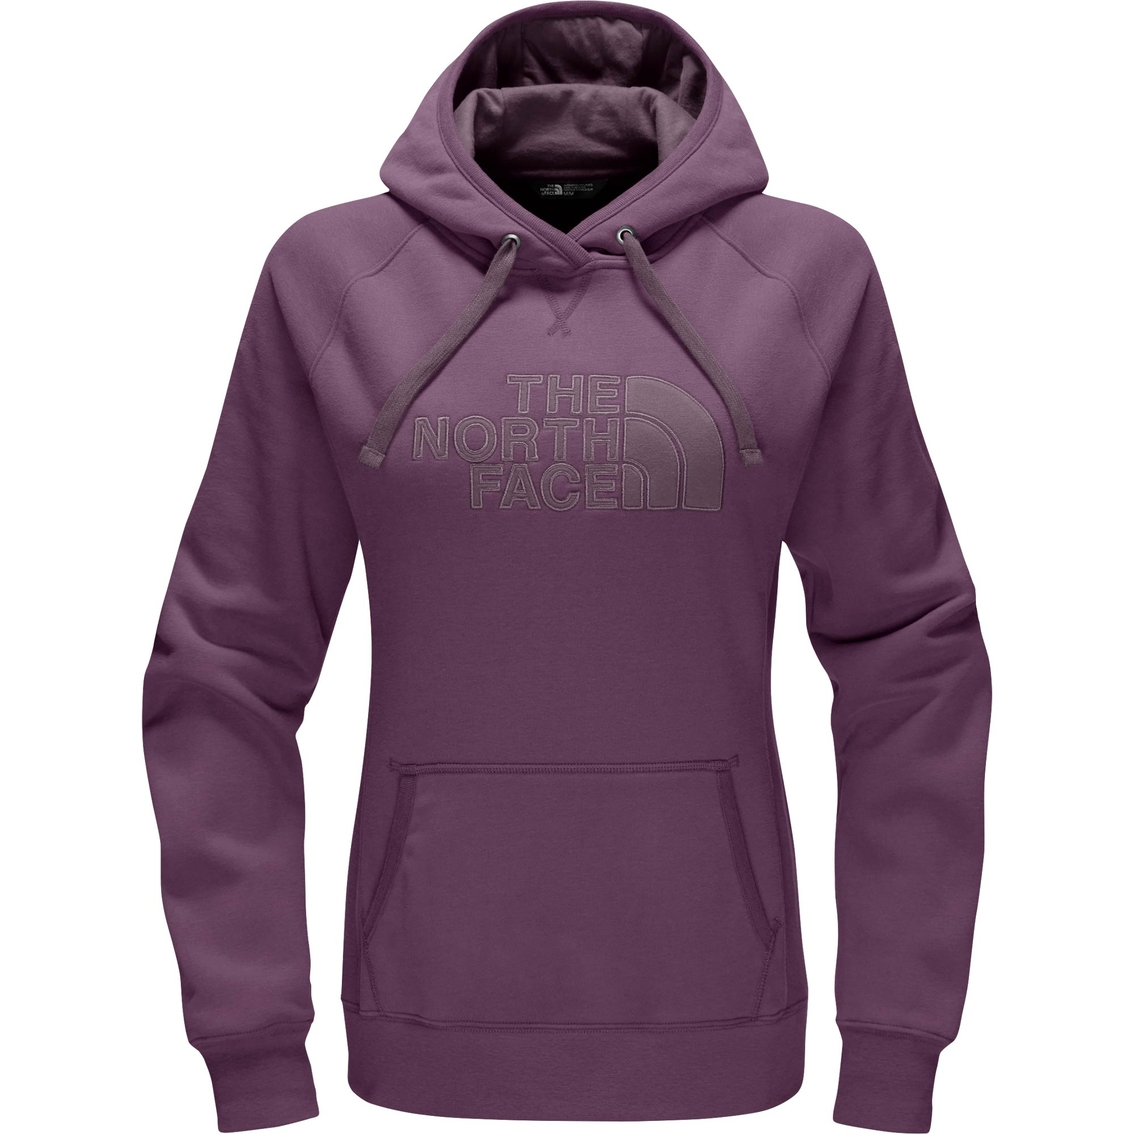 46ab93e4e The North Face Avalon Half Dome Hoodie | Hoodies & Sweatshirts ...